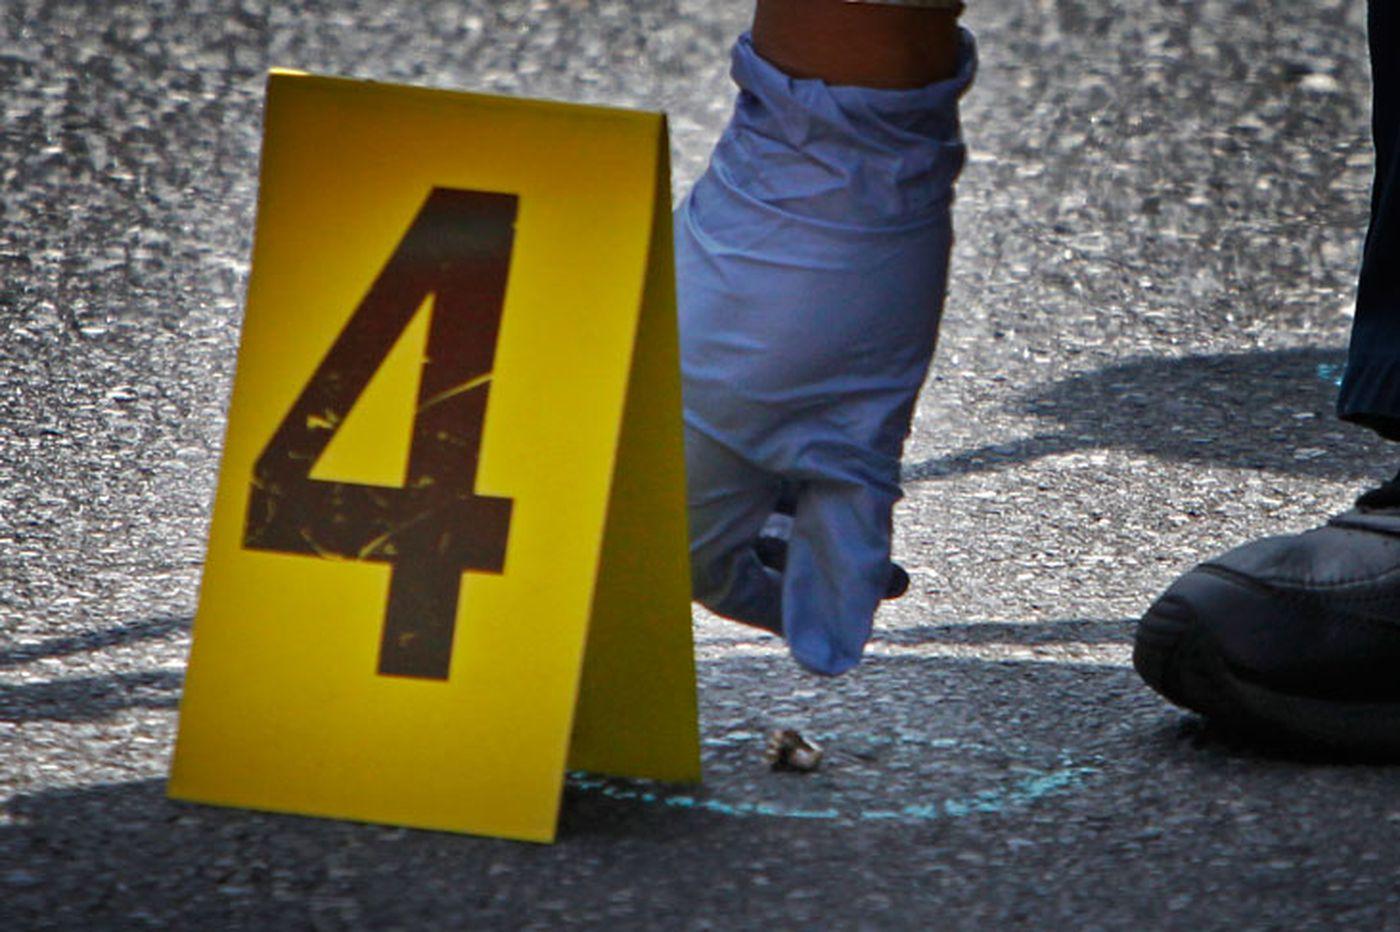 Third teenager shot dead in a week in Philadelphia